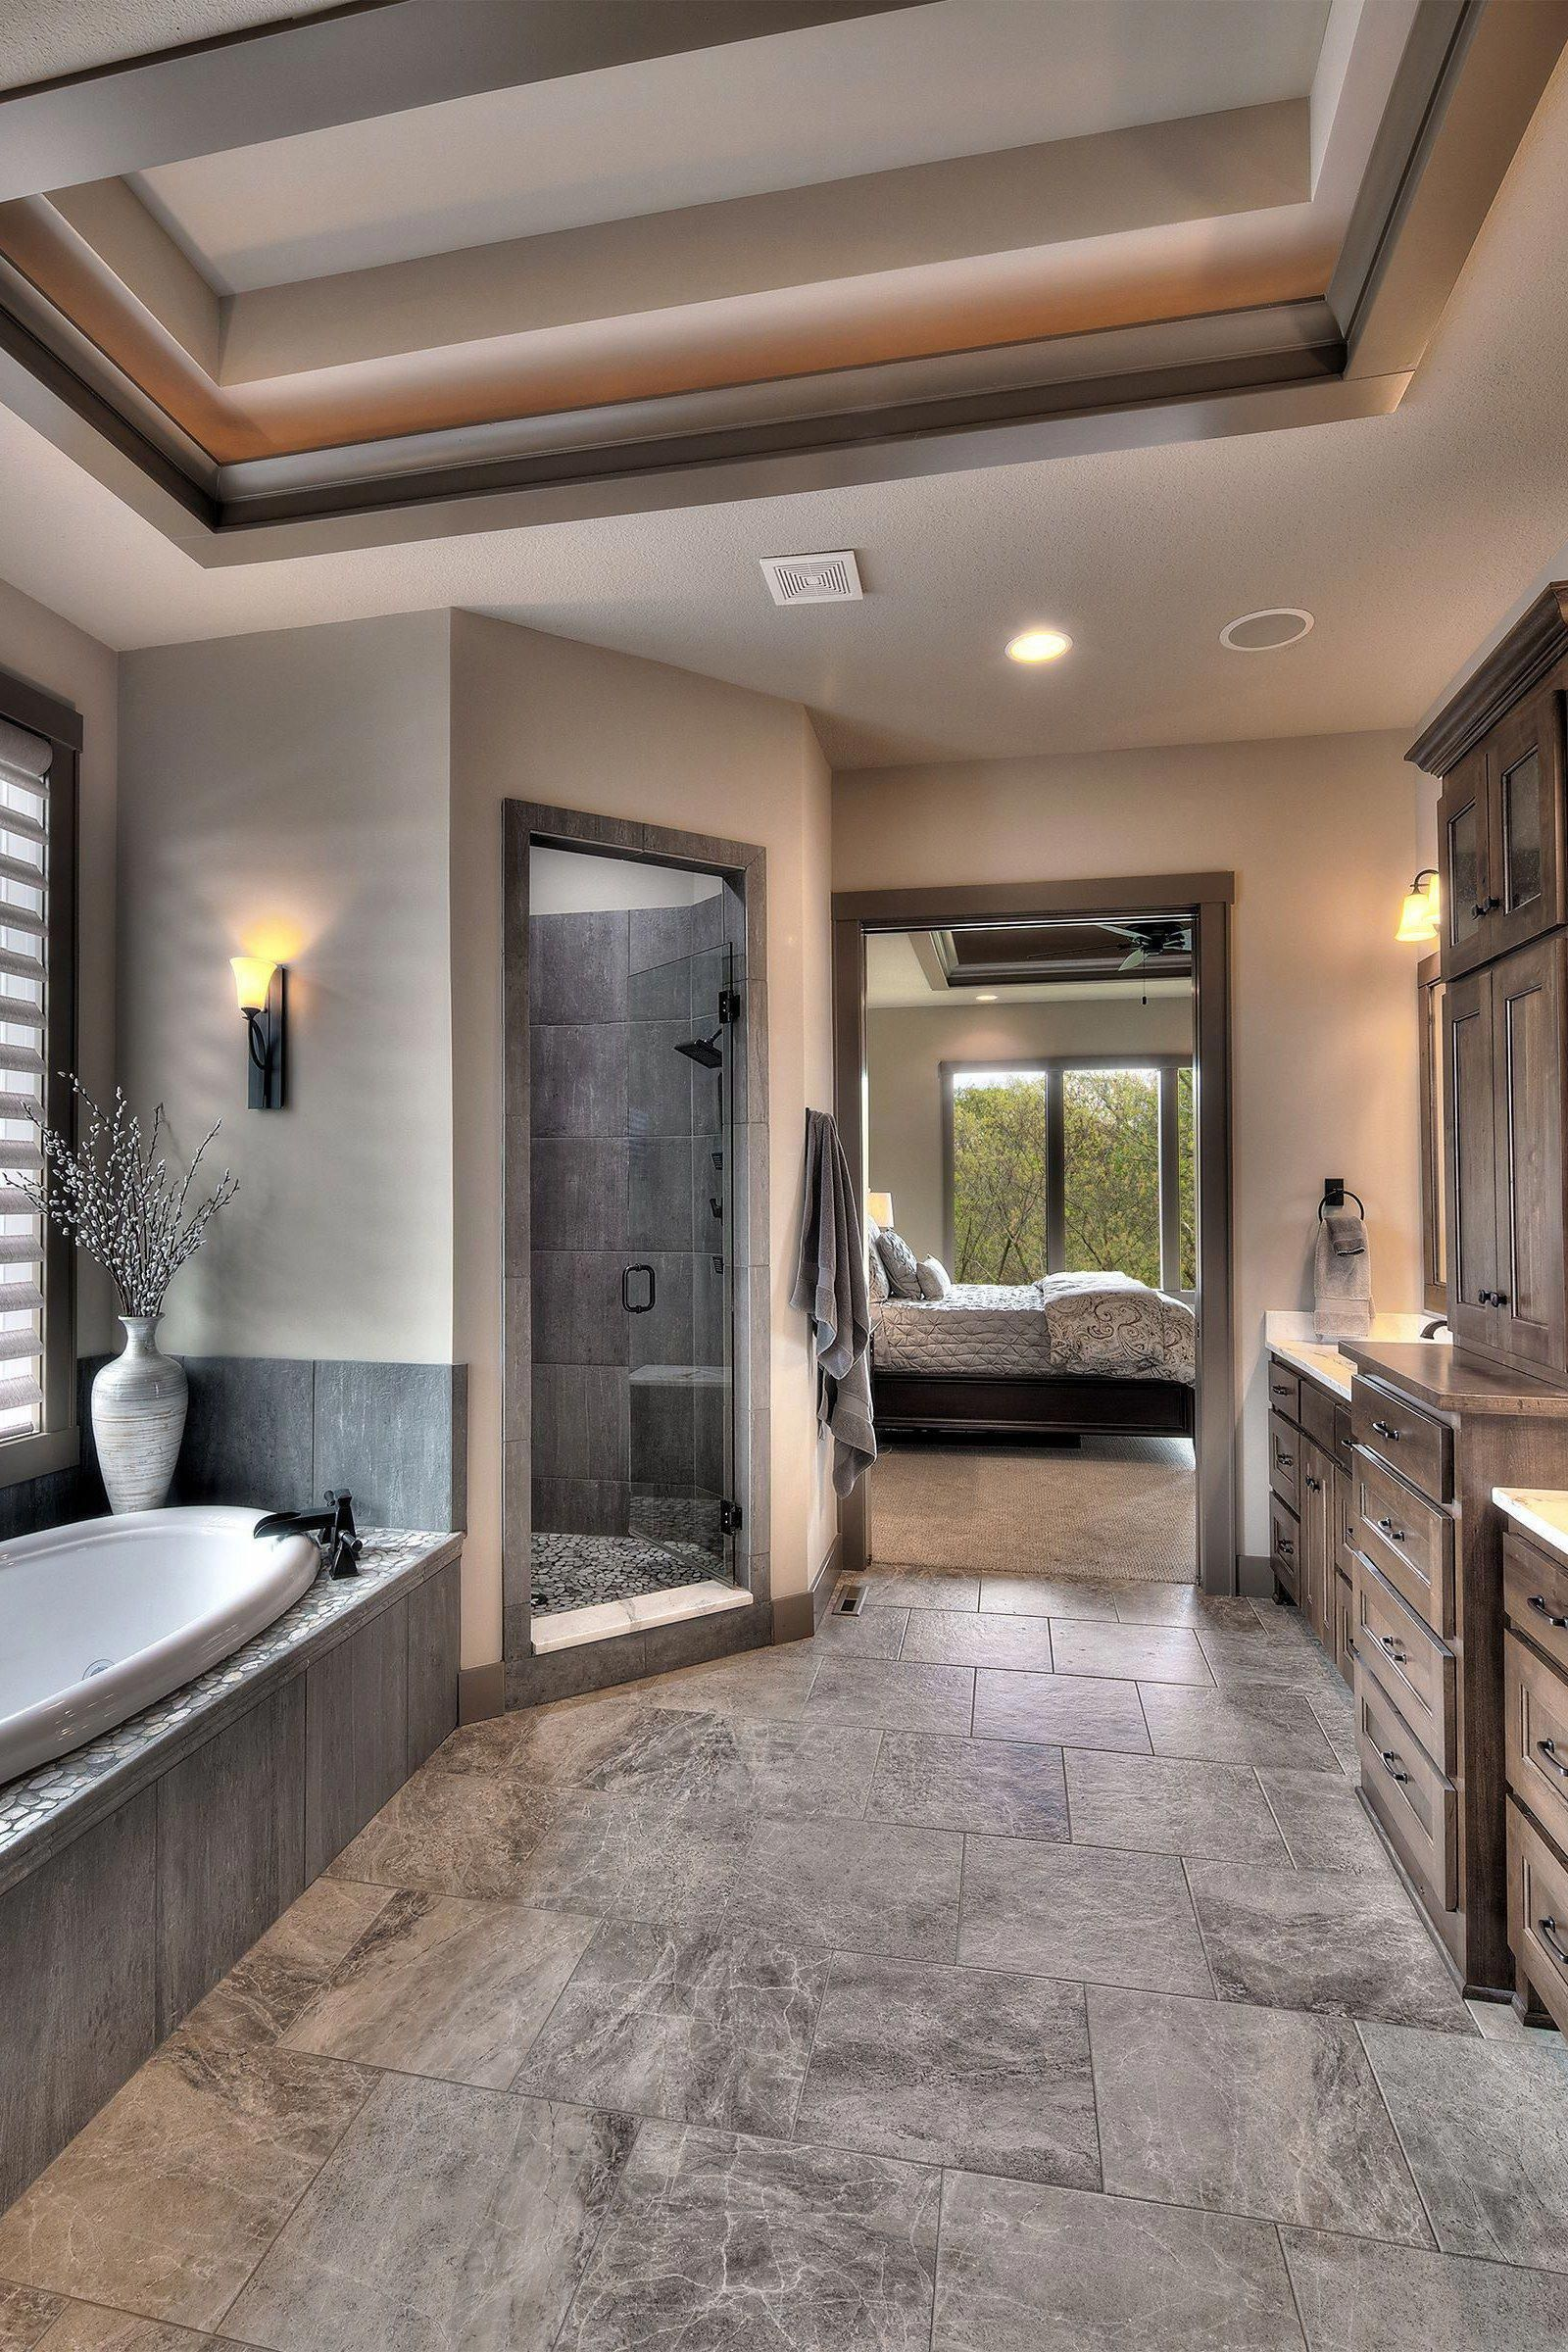 The Best Bathroom ideas #bañolujo #bañosdelujo #ideas #bathrom #bathroom #interiordesign #bathroomdesign #design #interior #bathroomdecor #kitchen #home #homedecor #bath #shower #homedesign #tiles #tile #bathroomremodel #architecture #renovation #marble #construction #decor #interiors #luxury #kitchendesign #bathroomrenovation #bedroom #bathrooms #realestate #bathtub #toilet #myluxepoint #madrid #barcelona #spain #portugal #españa